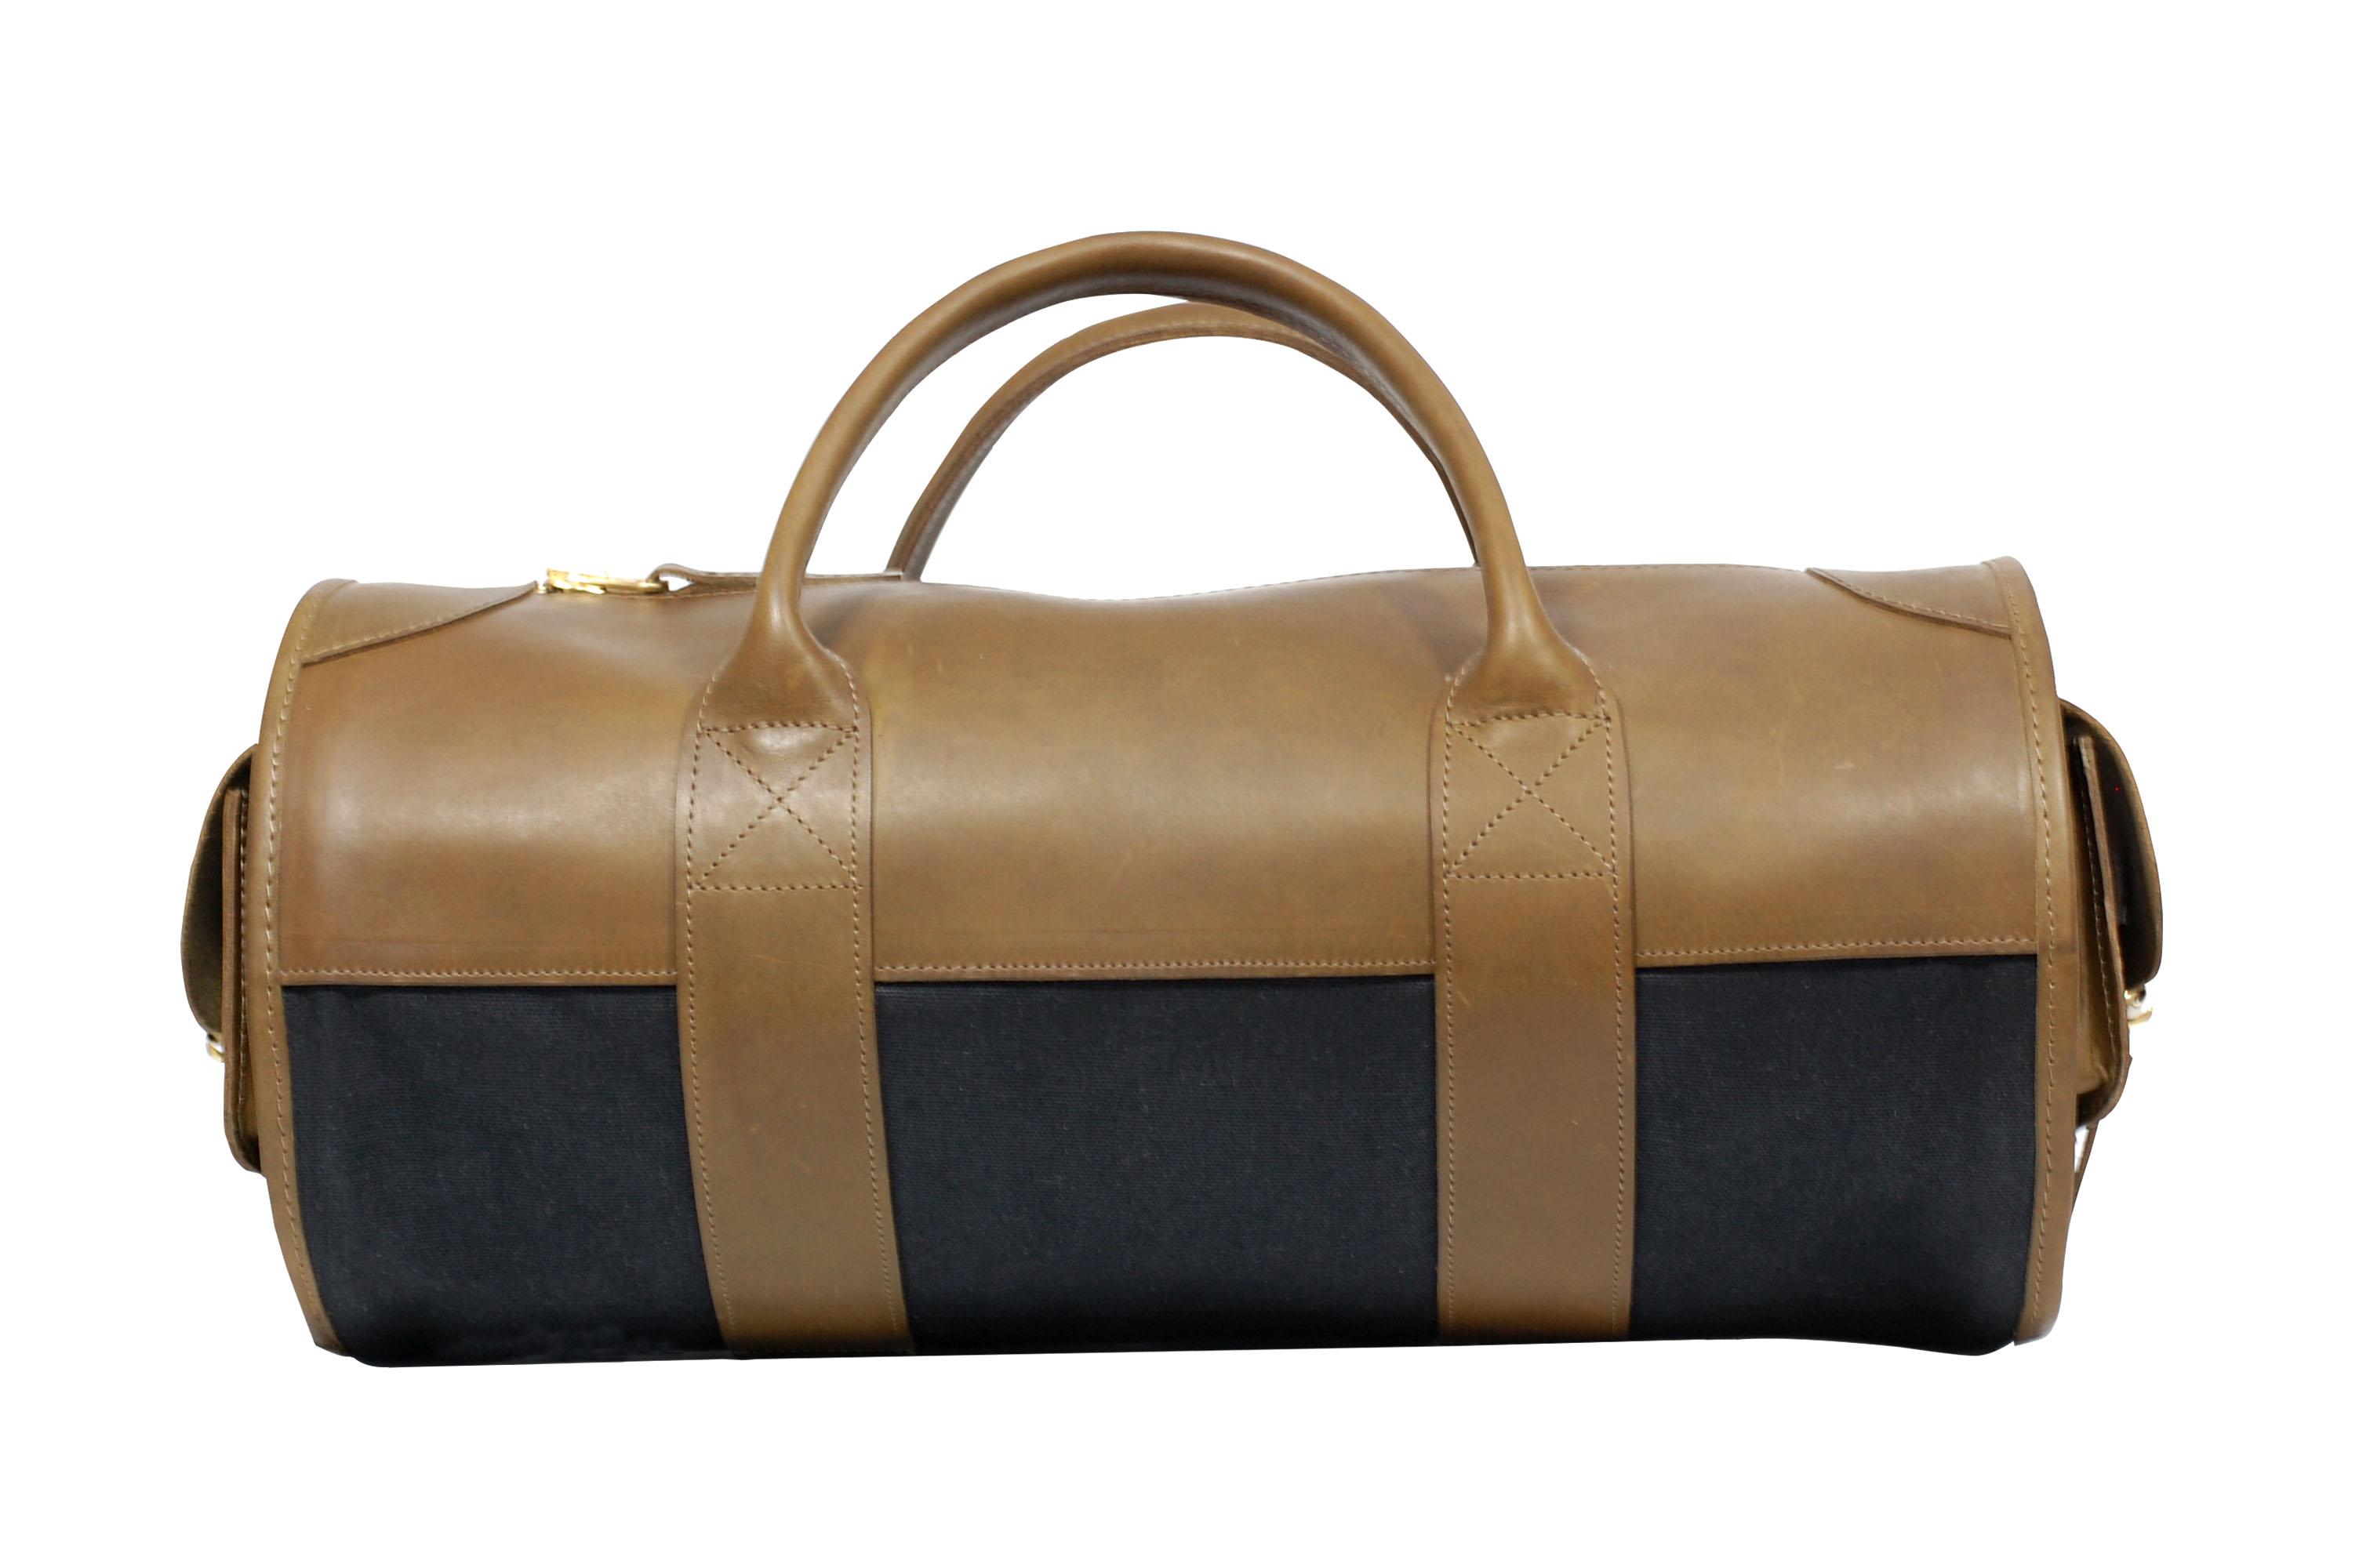 MAhiout Valle bag, Luxury designer bag